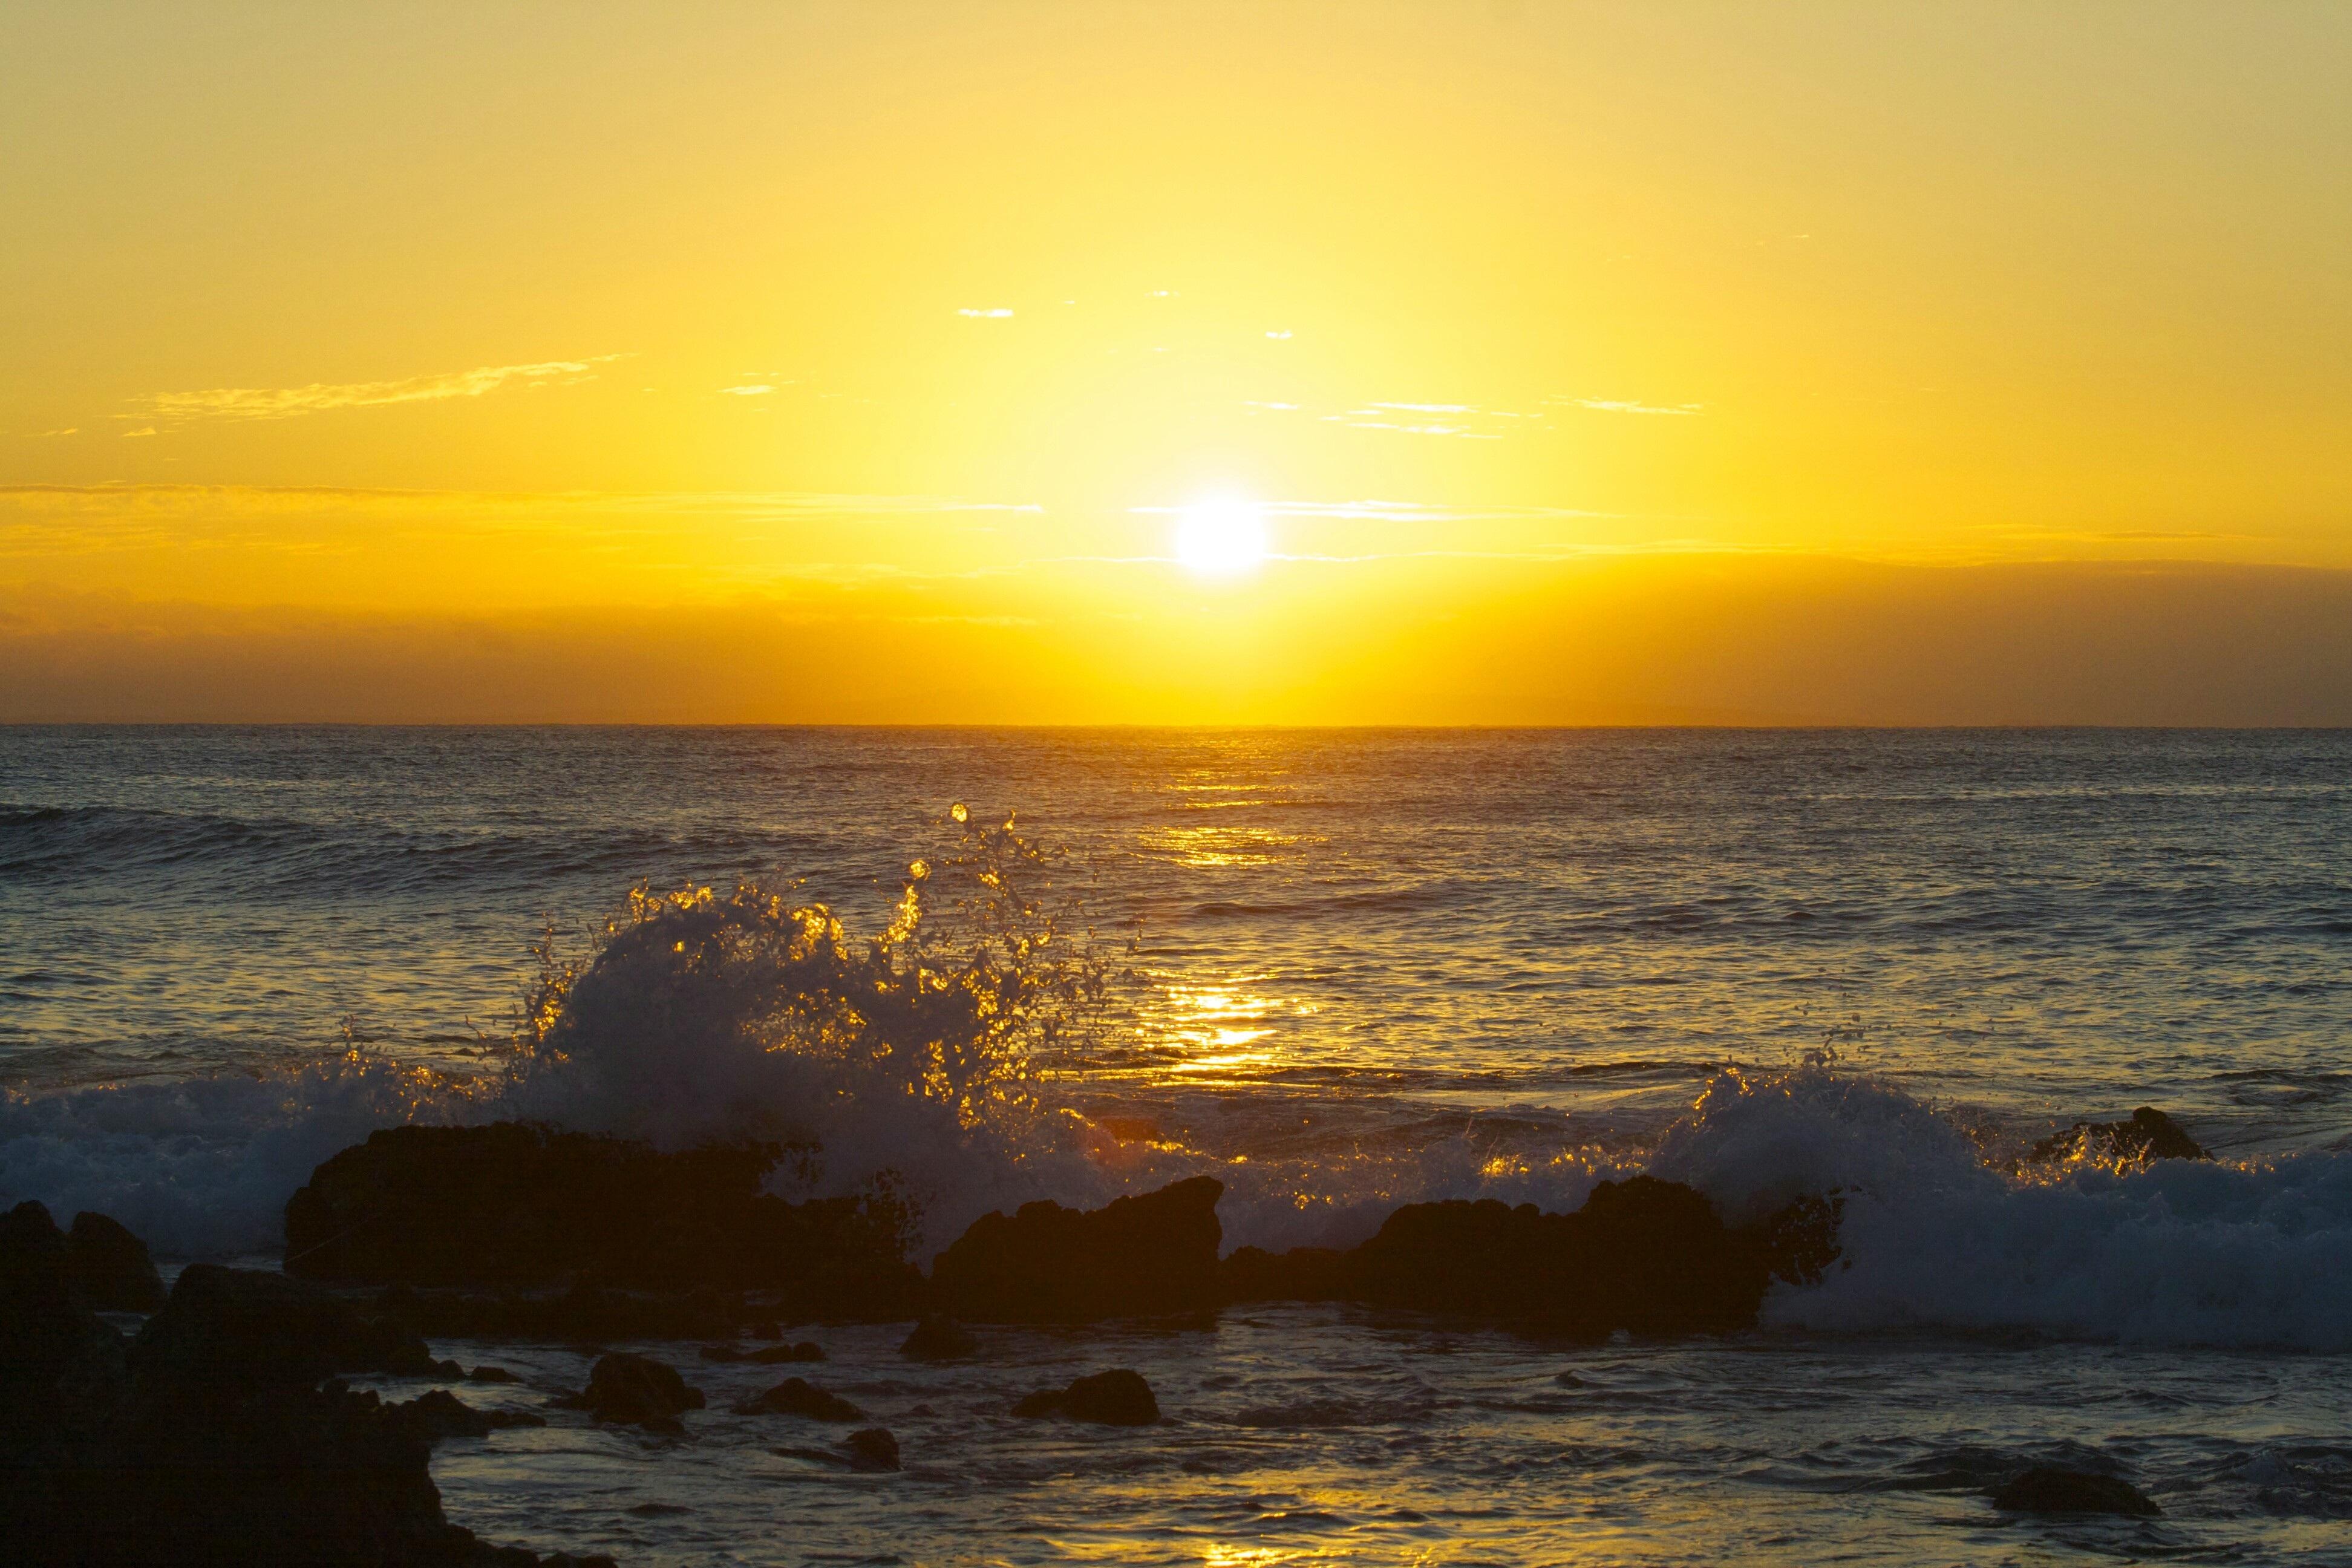 Free Images : beach, sea, coast, sand, ocean, horizon, sun